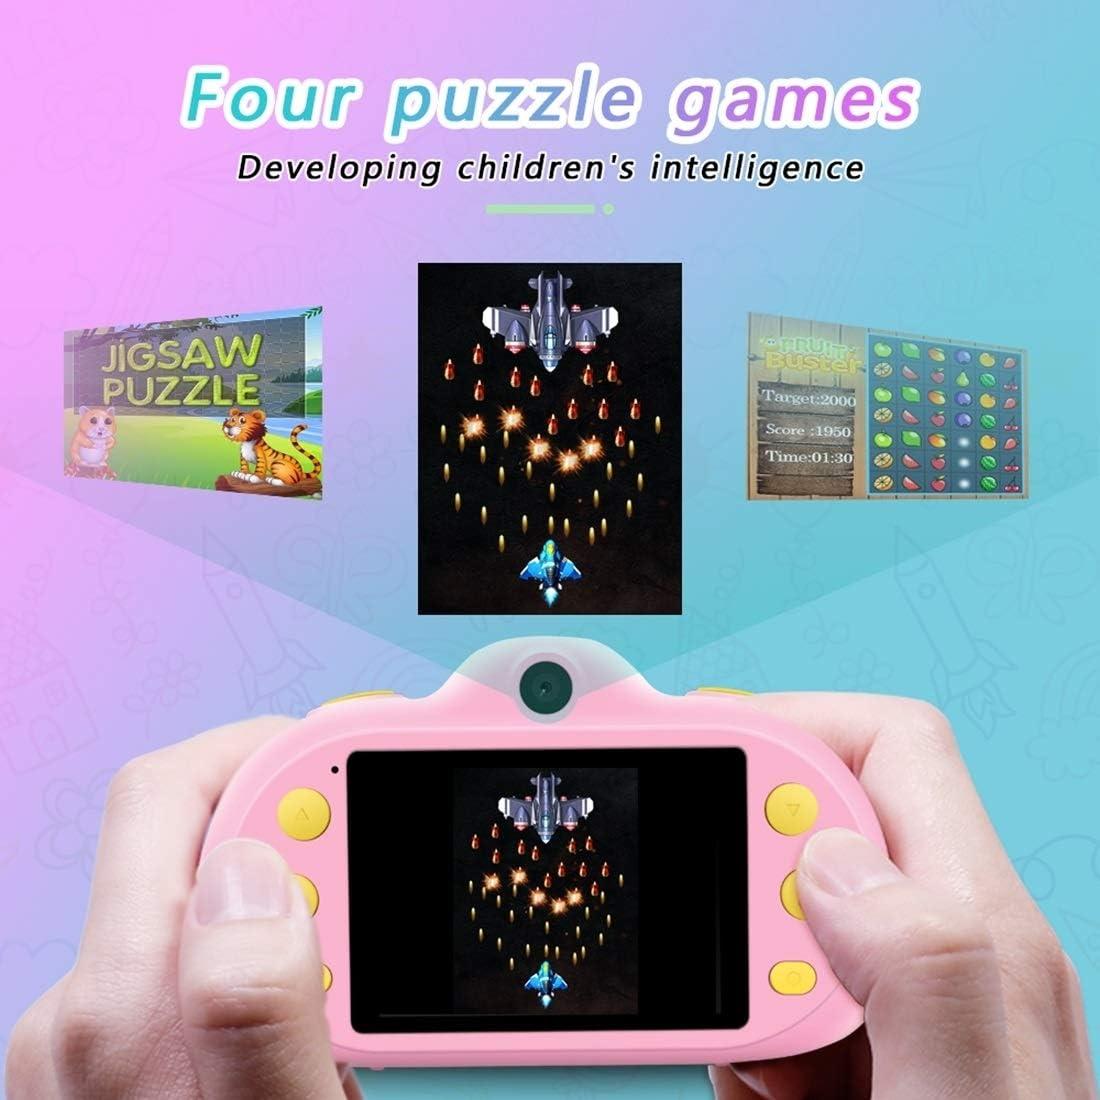 Für Kinder Digitalkamera CMF P8 2.4-Zoll-Acht-Megapixel-Doppel-Objektiv Kinder-Kamera, Unterstützung for 32 GB TF-Karte (Grün) (Color : Pink) Pink